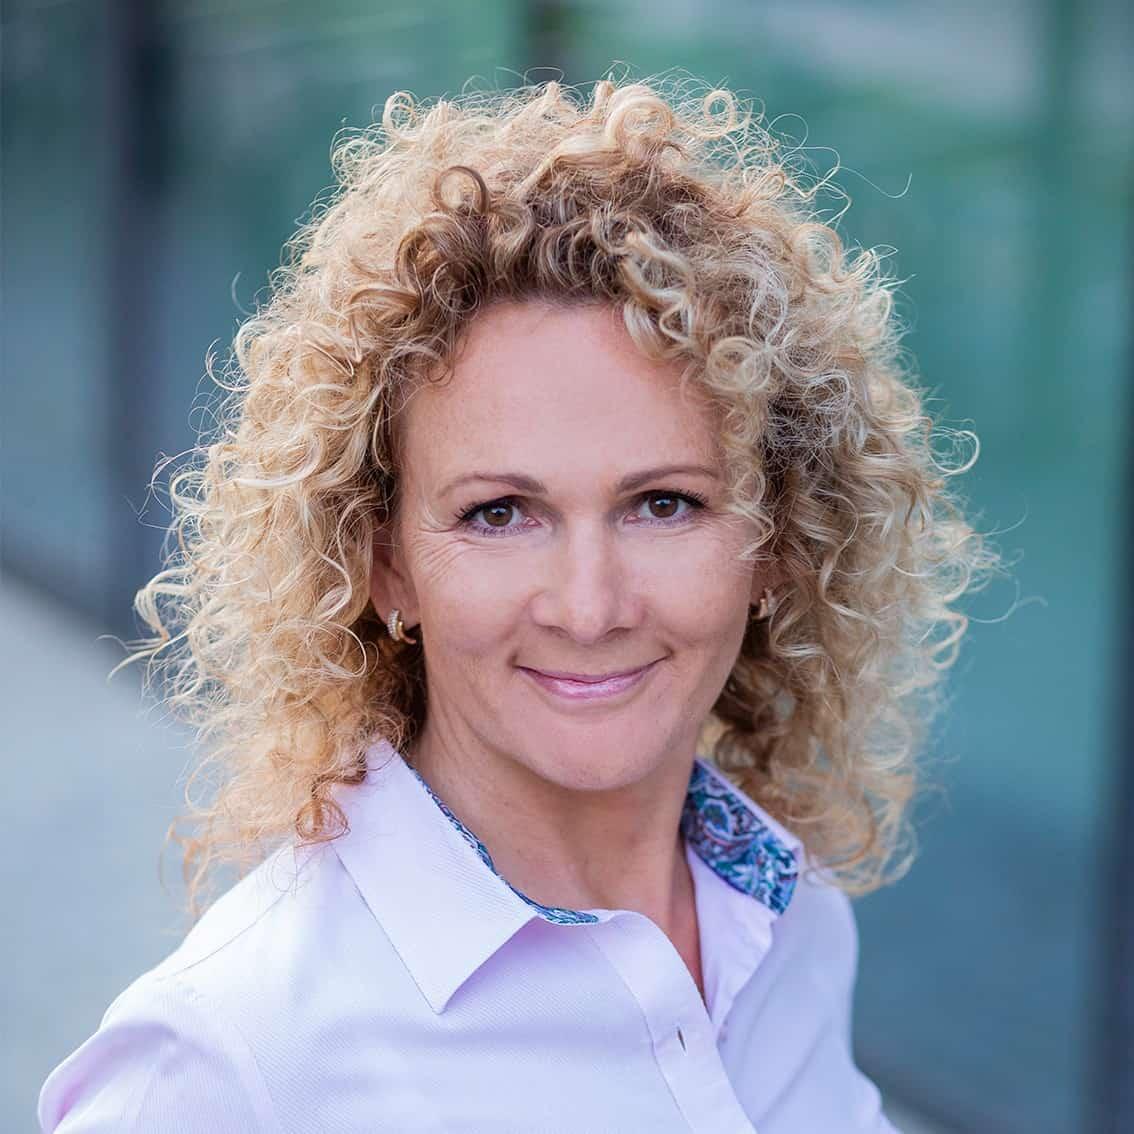 Agnieszka Cyniak